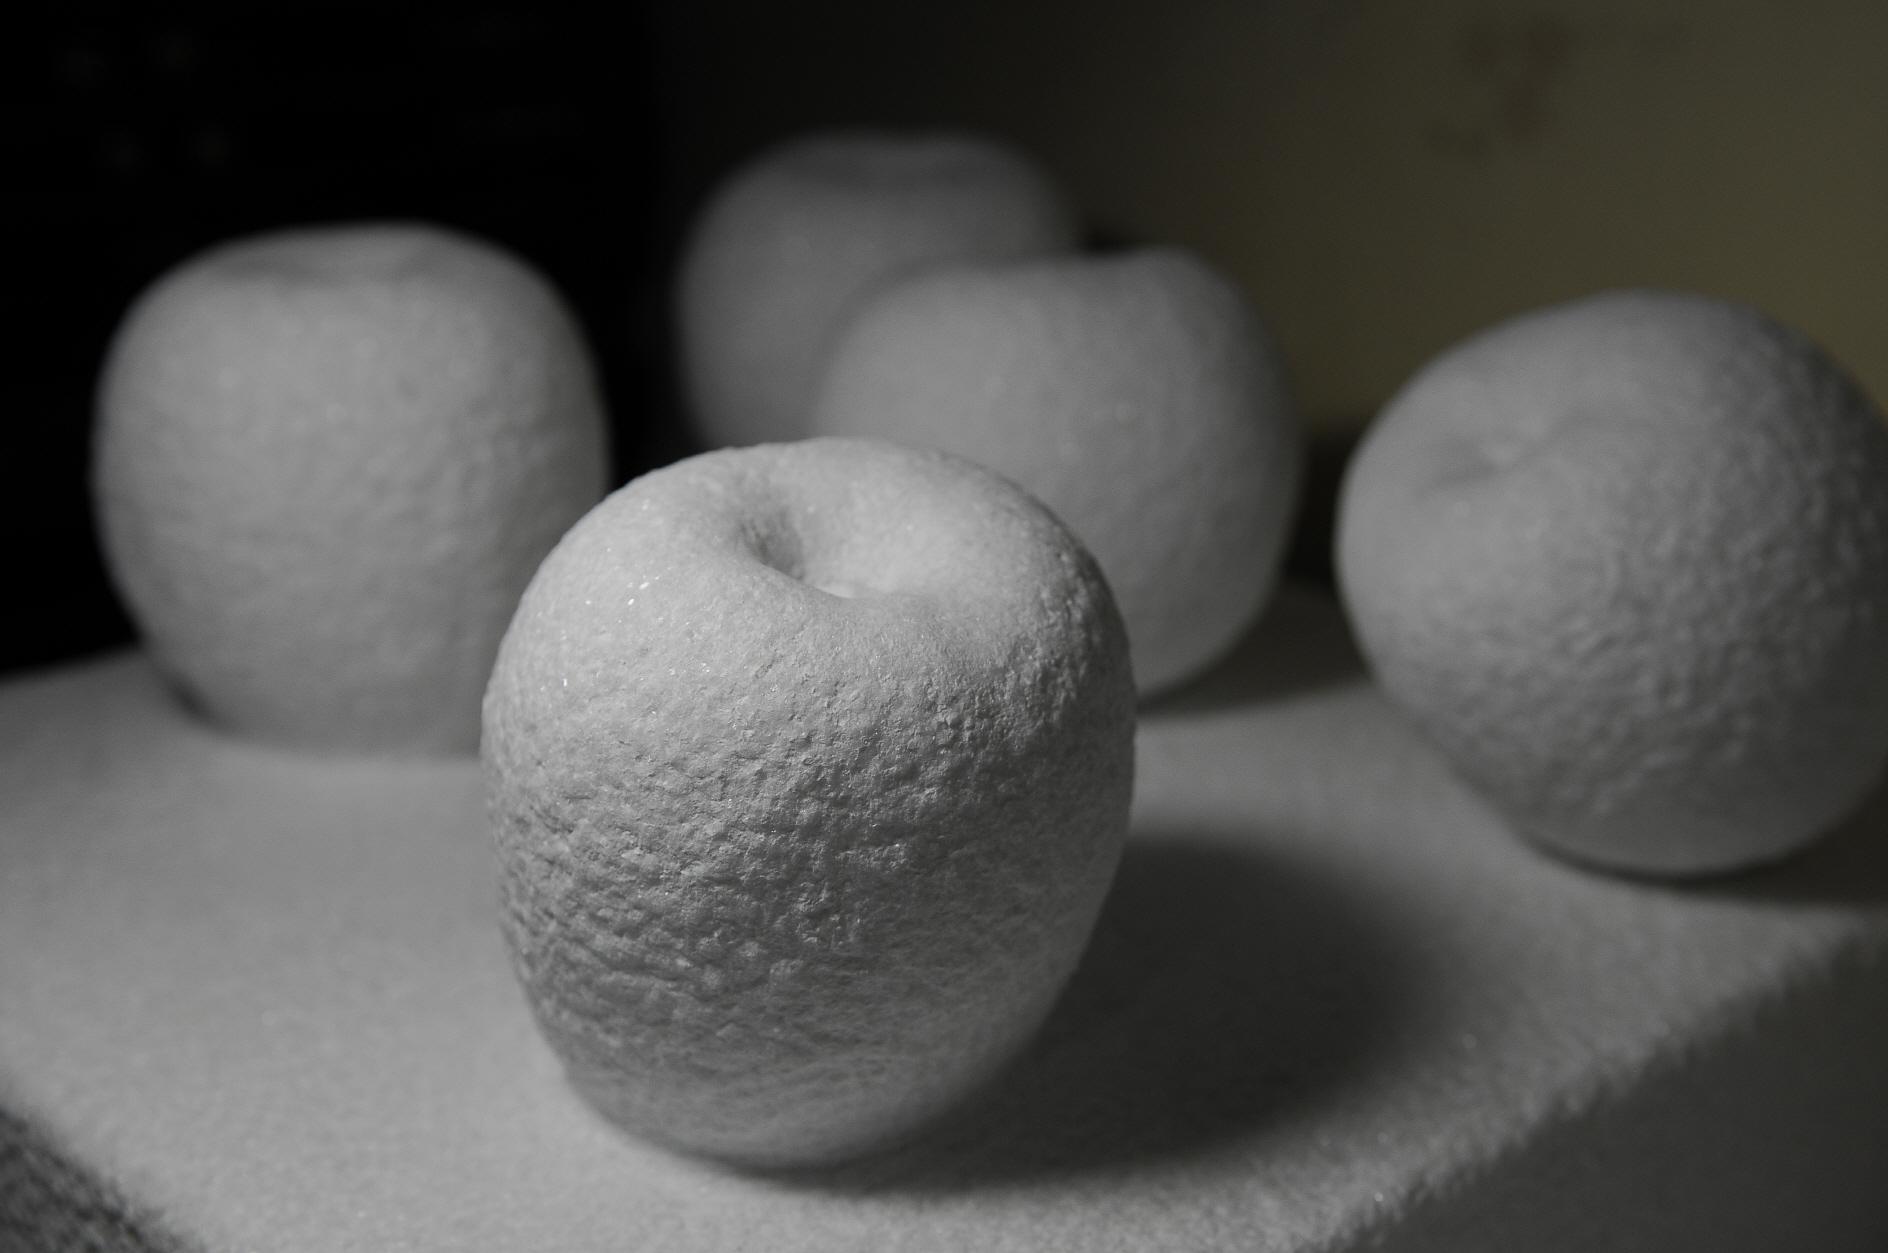 Apples 사과들